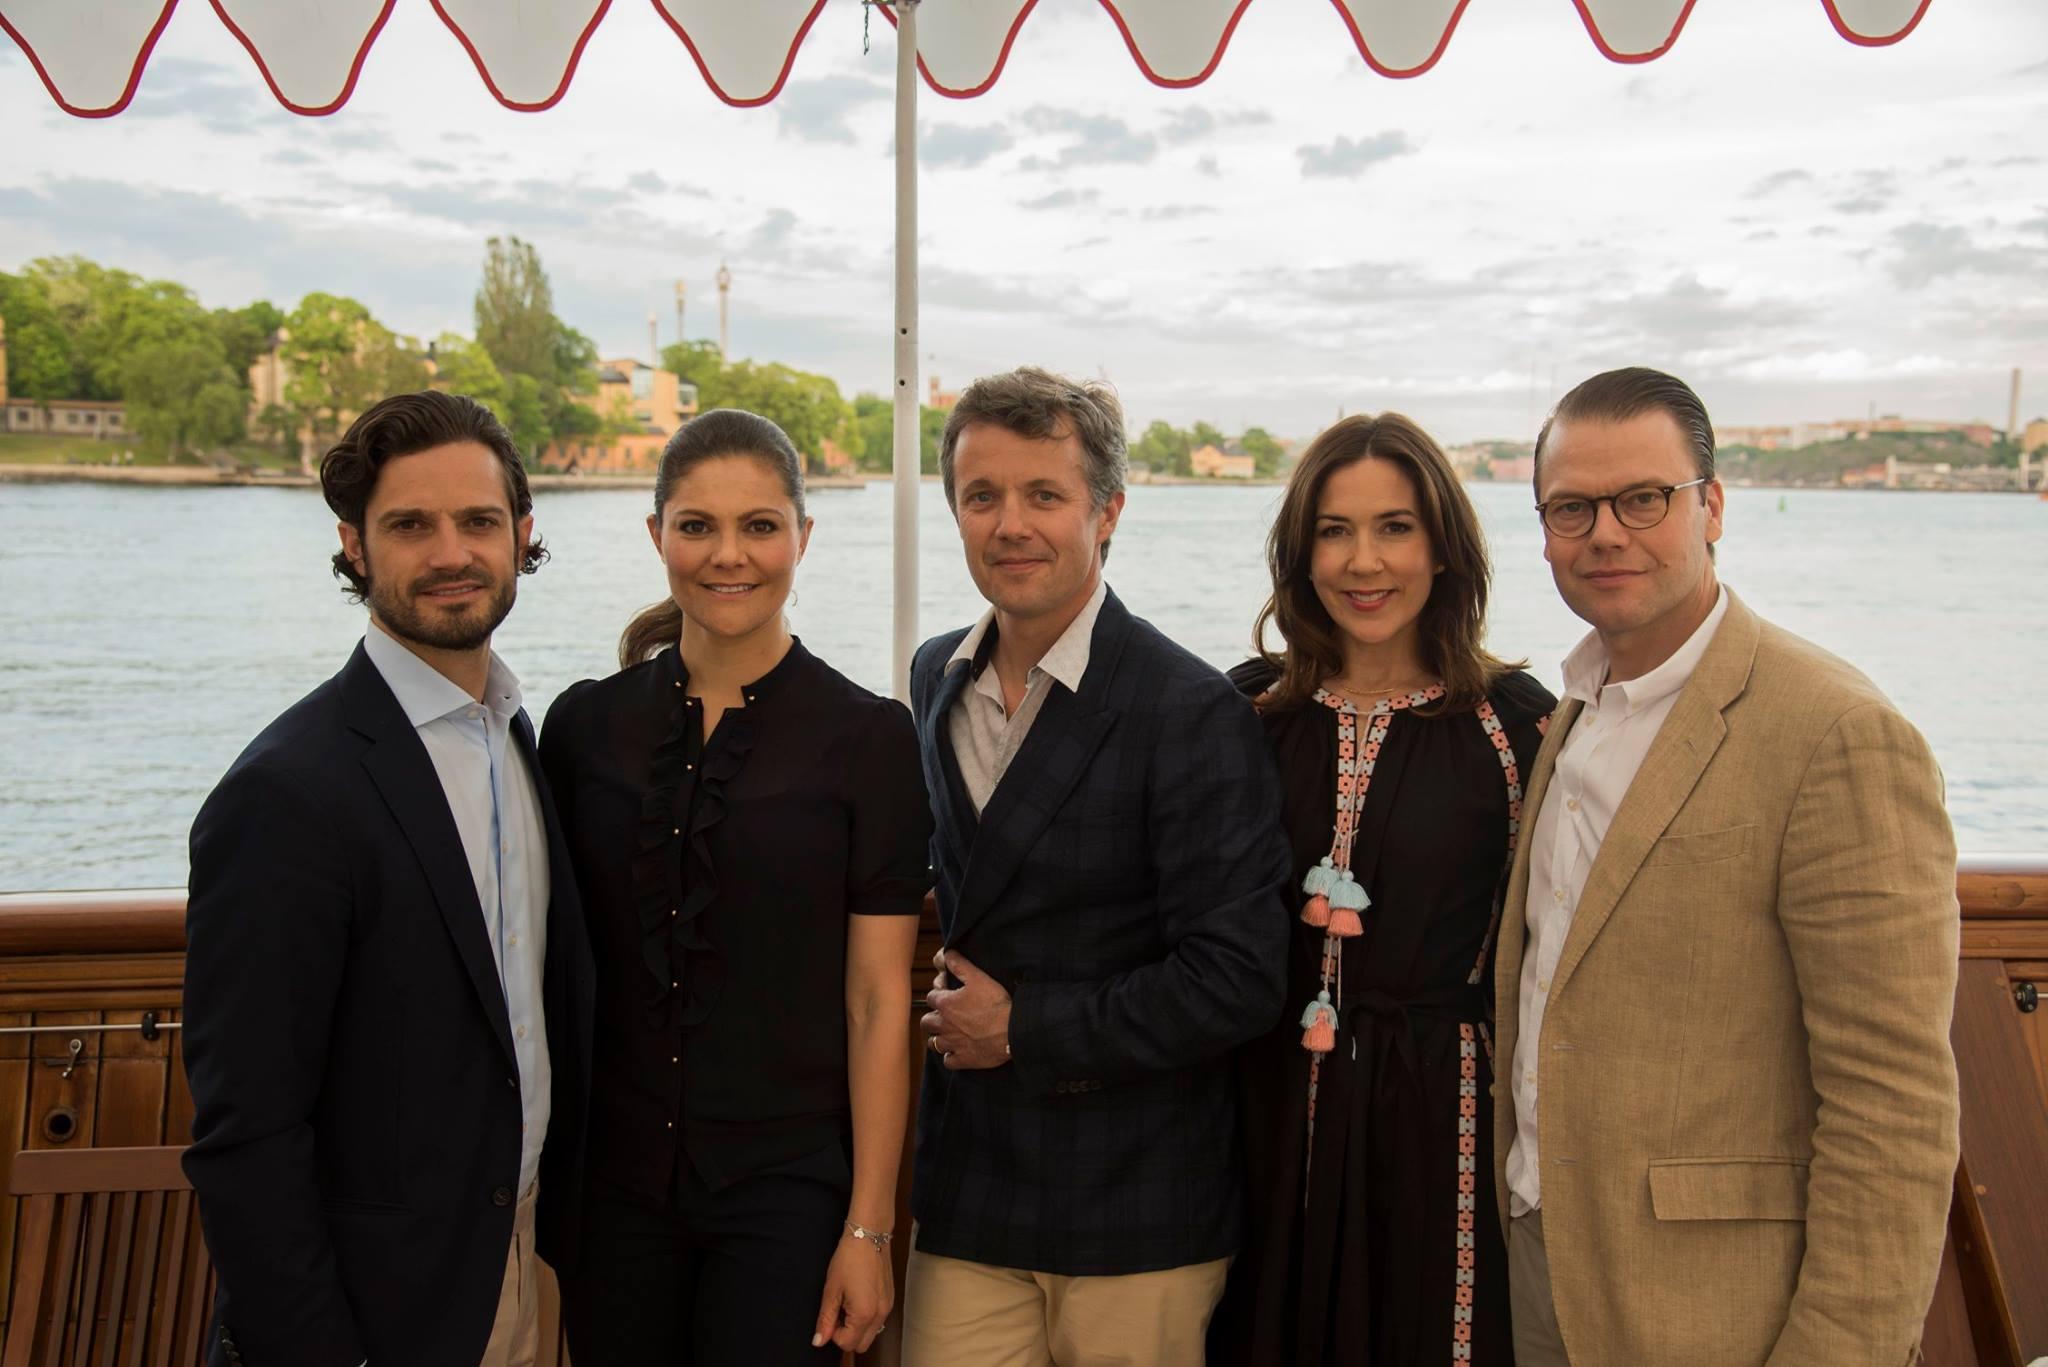 Photo: Danish Royal House on Facebook